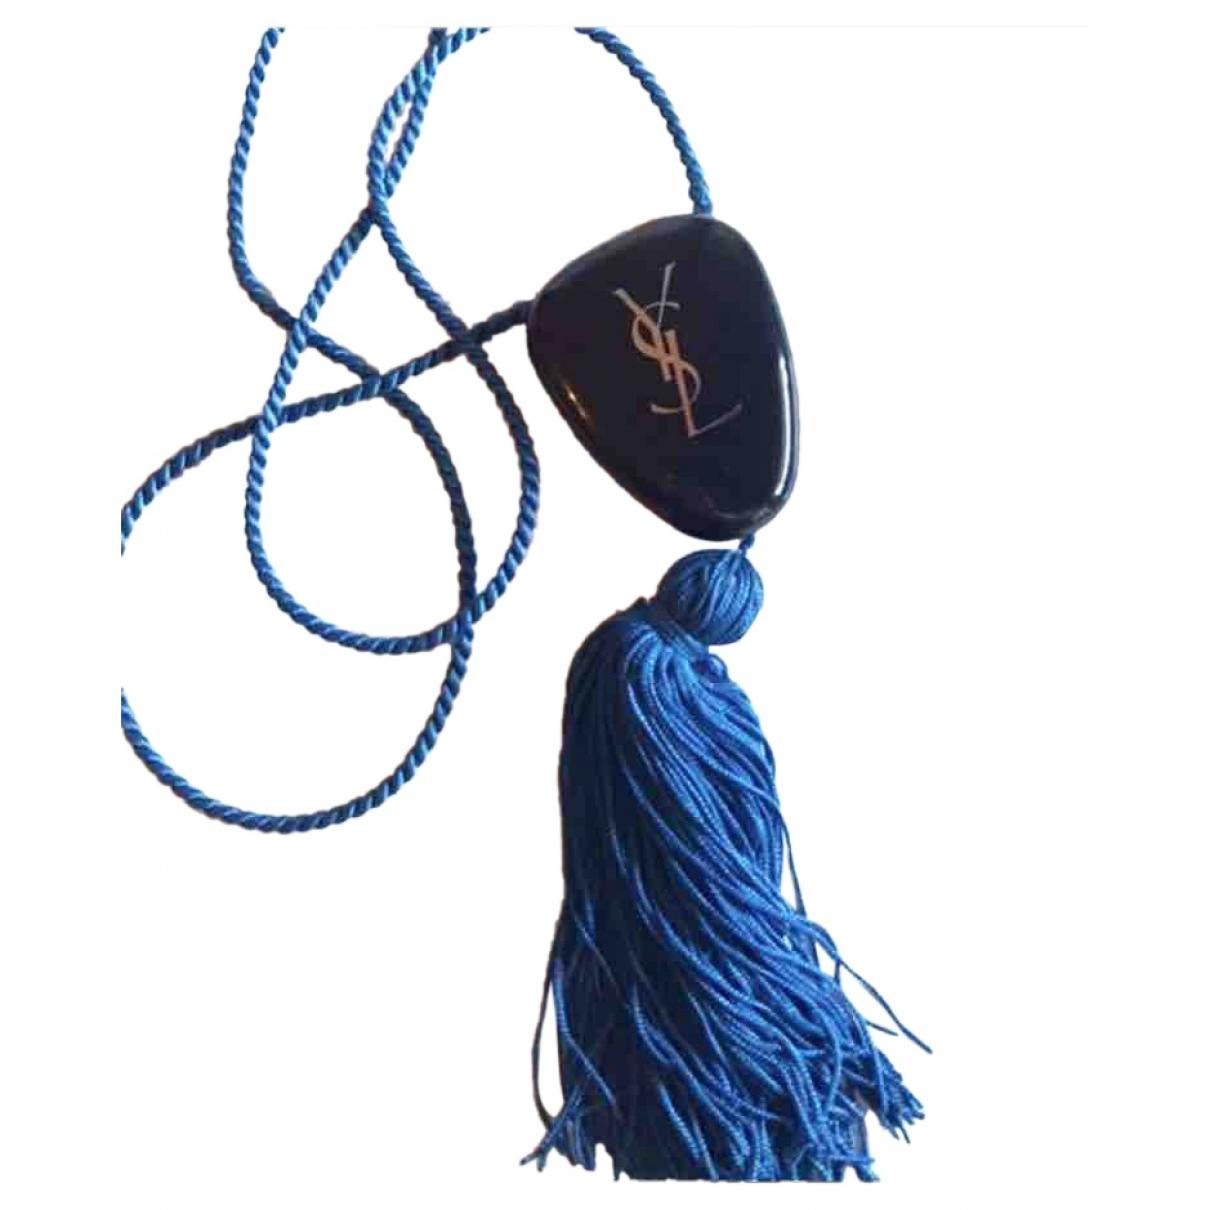 Yves Saint Laurent \N Blue necklace for Women \N